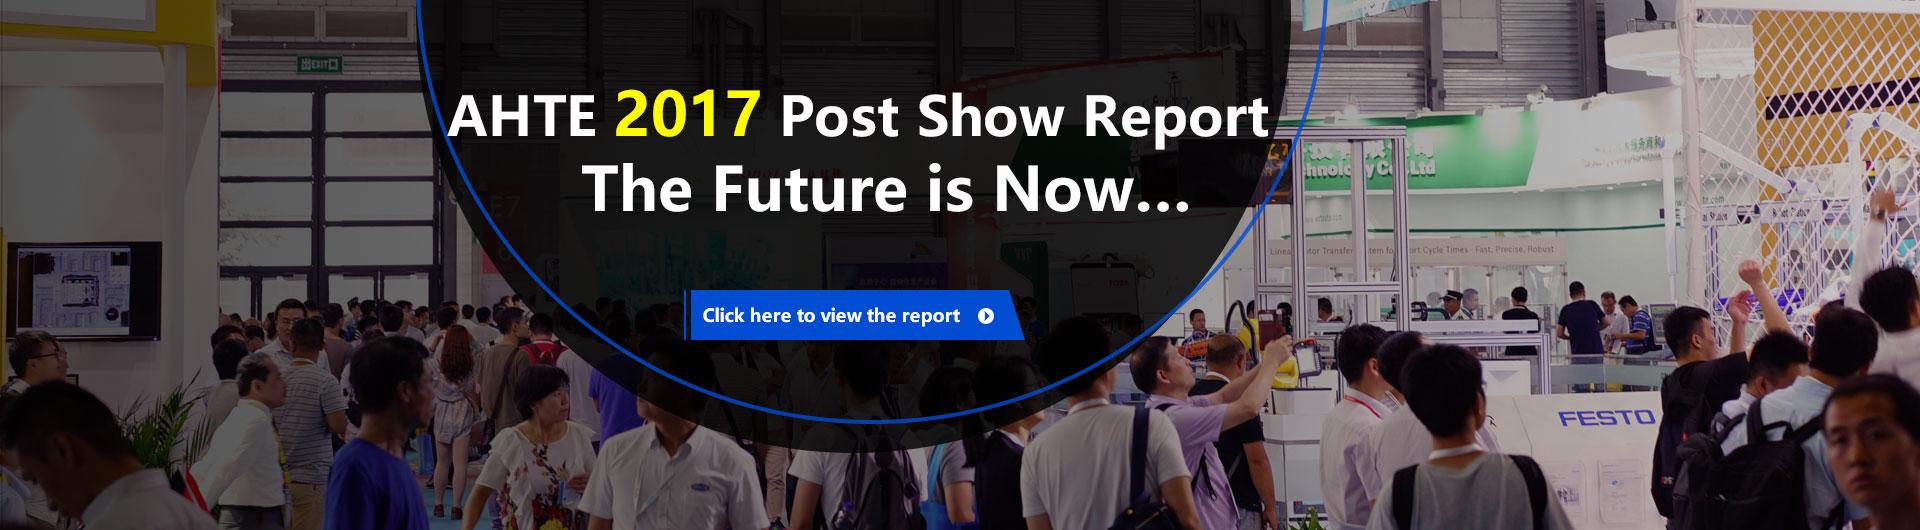 2017 post show report